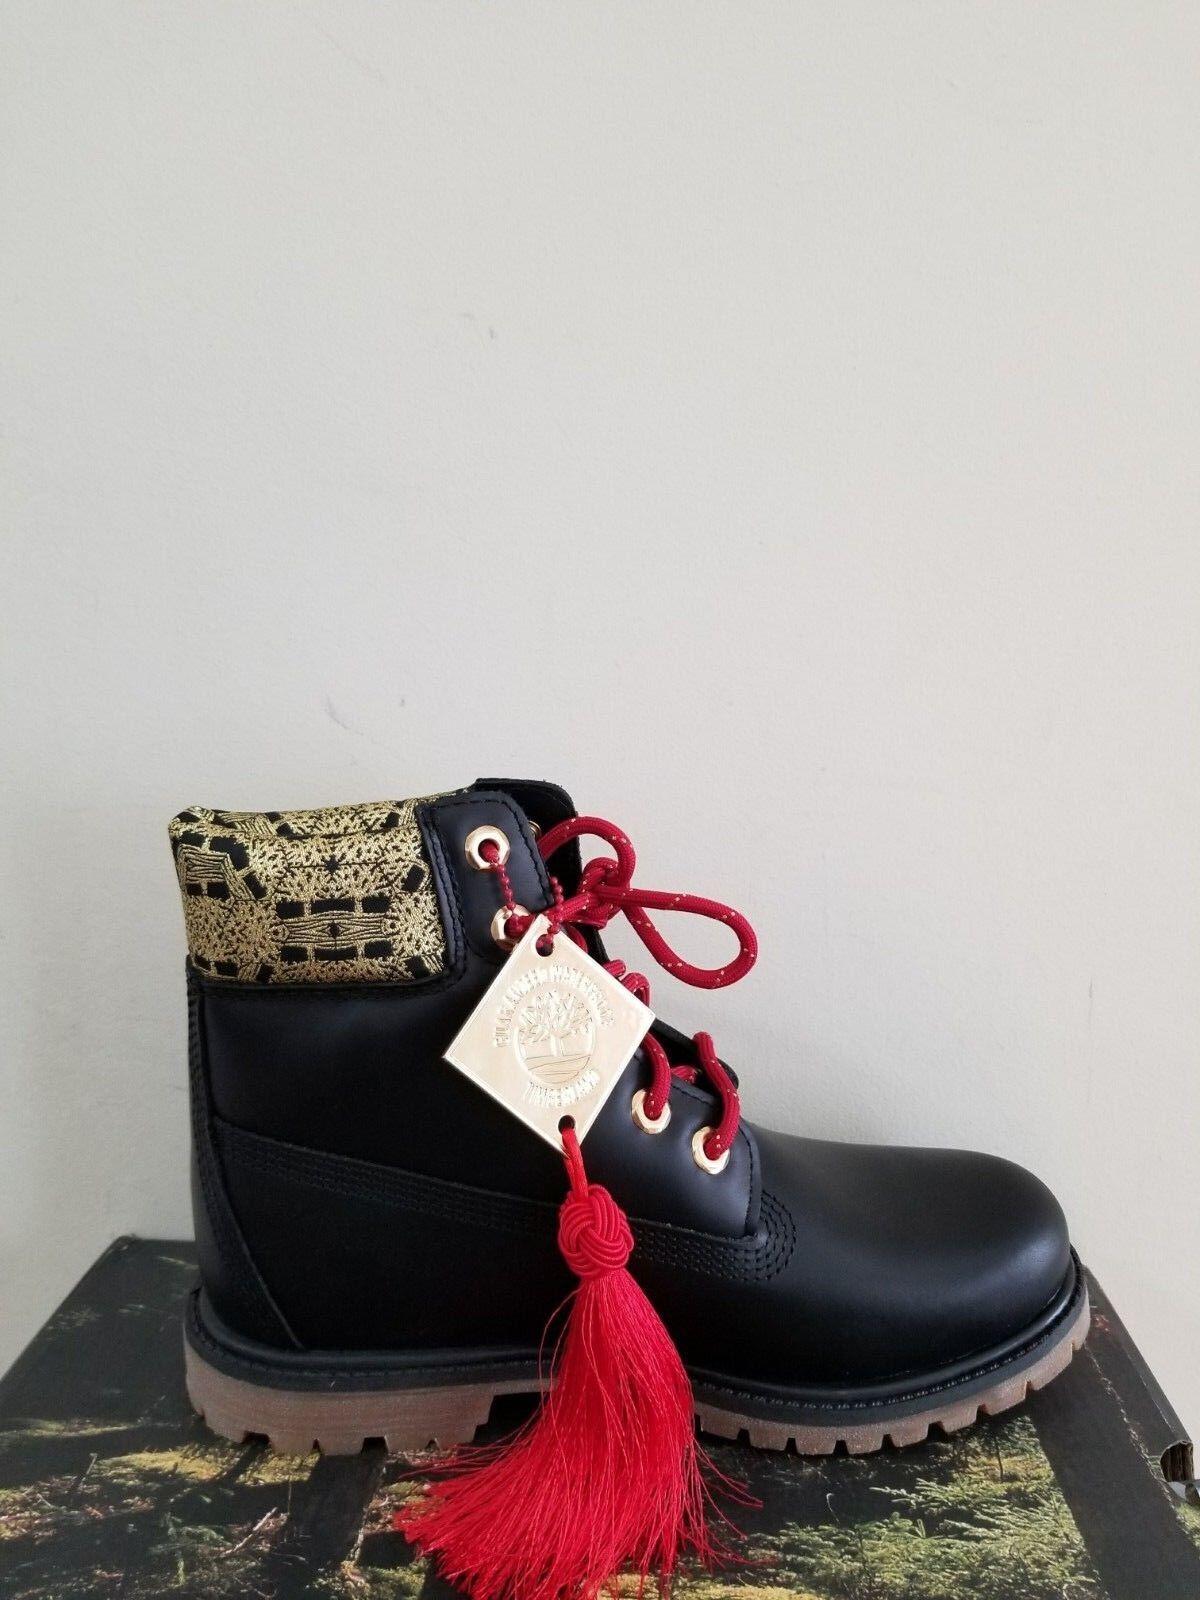 "Timberland Women's 6 inch"" Double Sole Premium Waterproof Boots NIB 1"